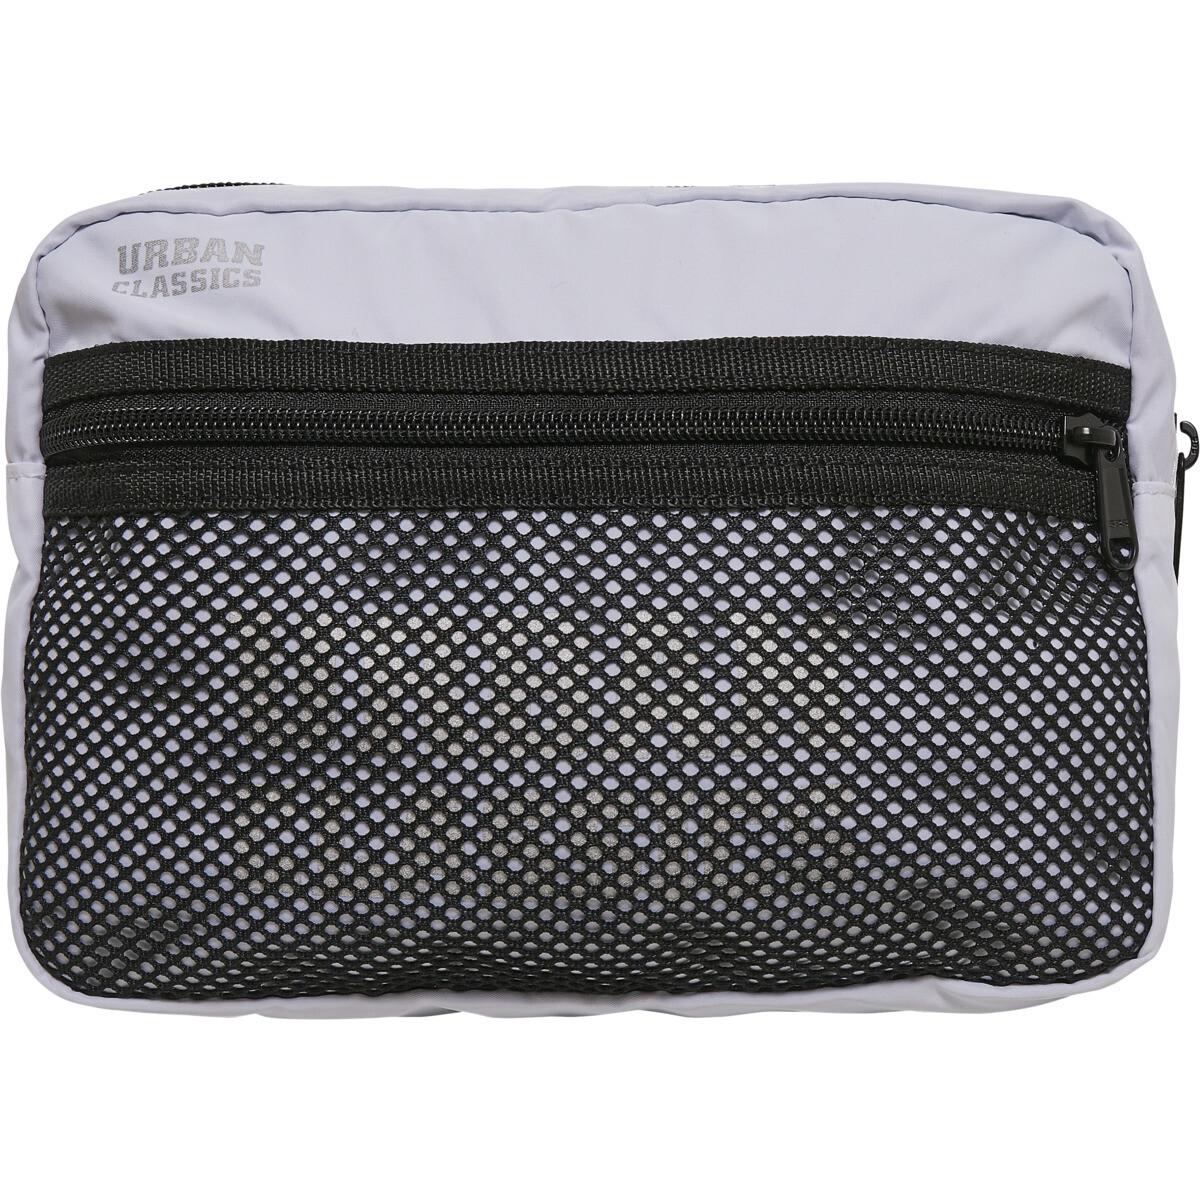 Urban Classics Chest Bag - Weiss